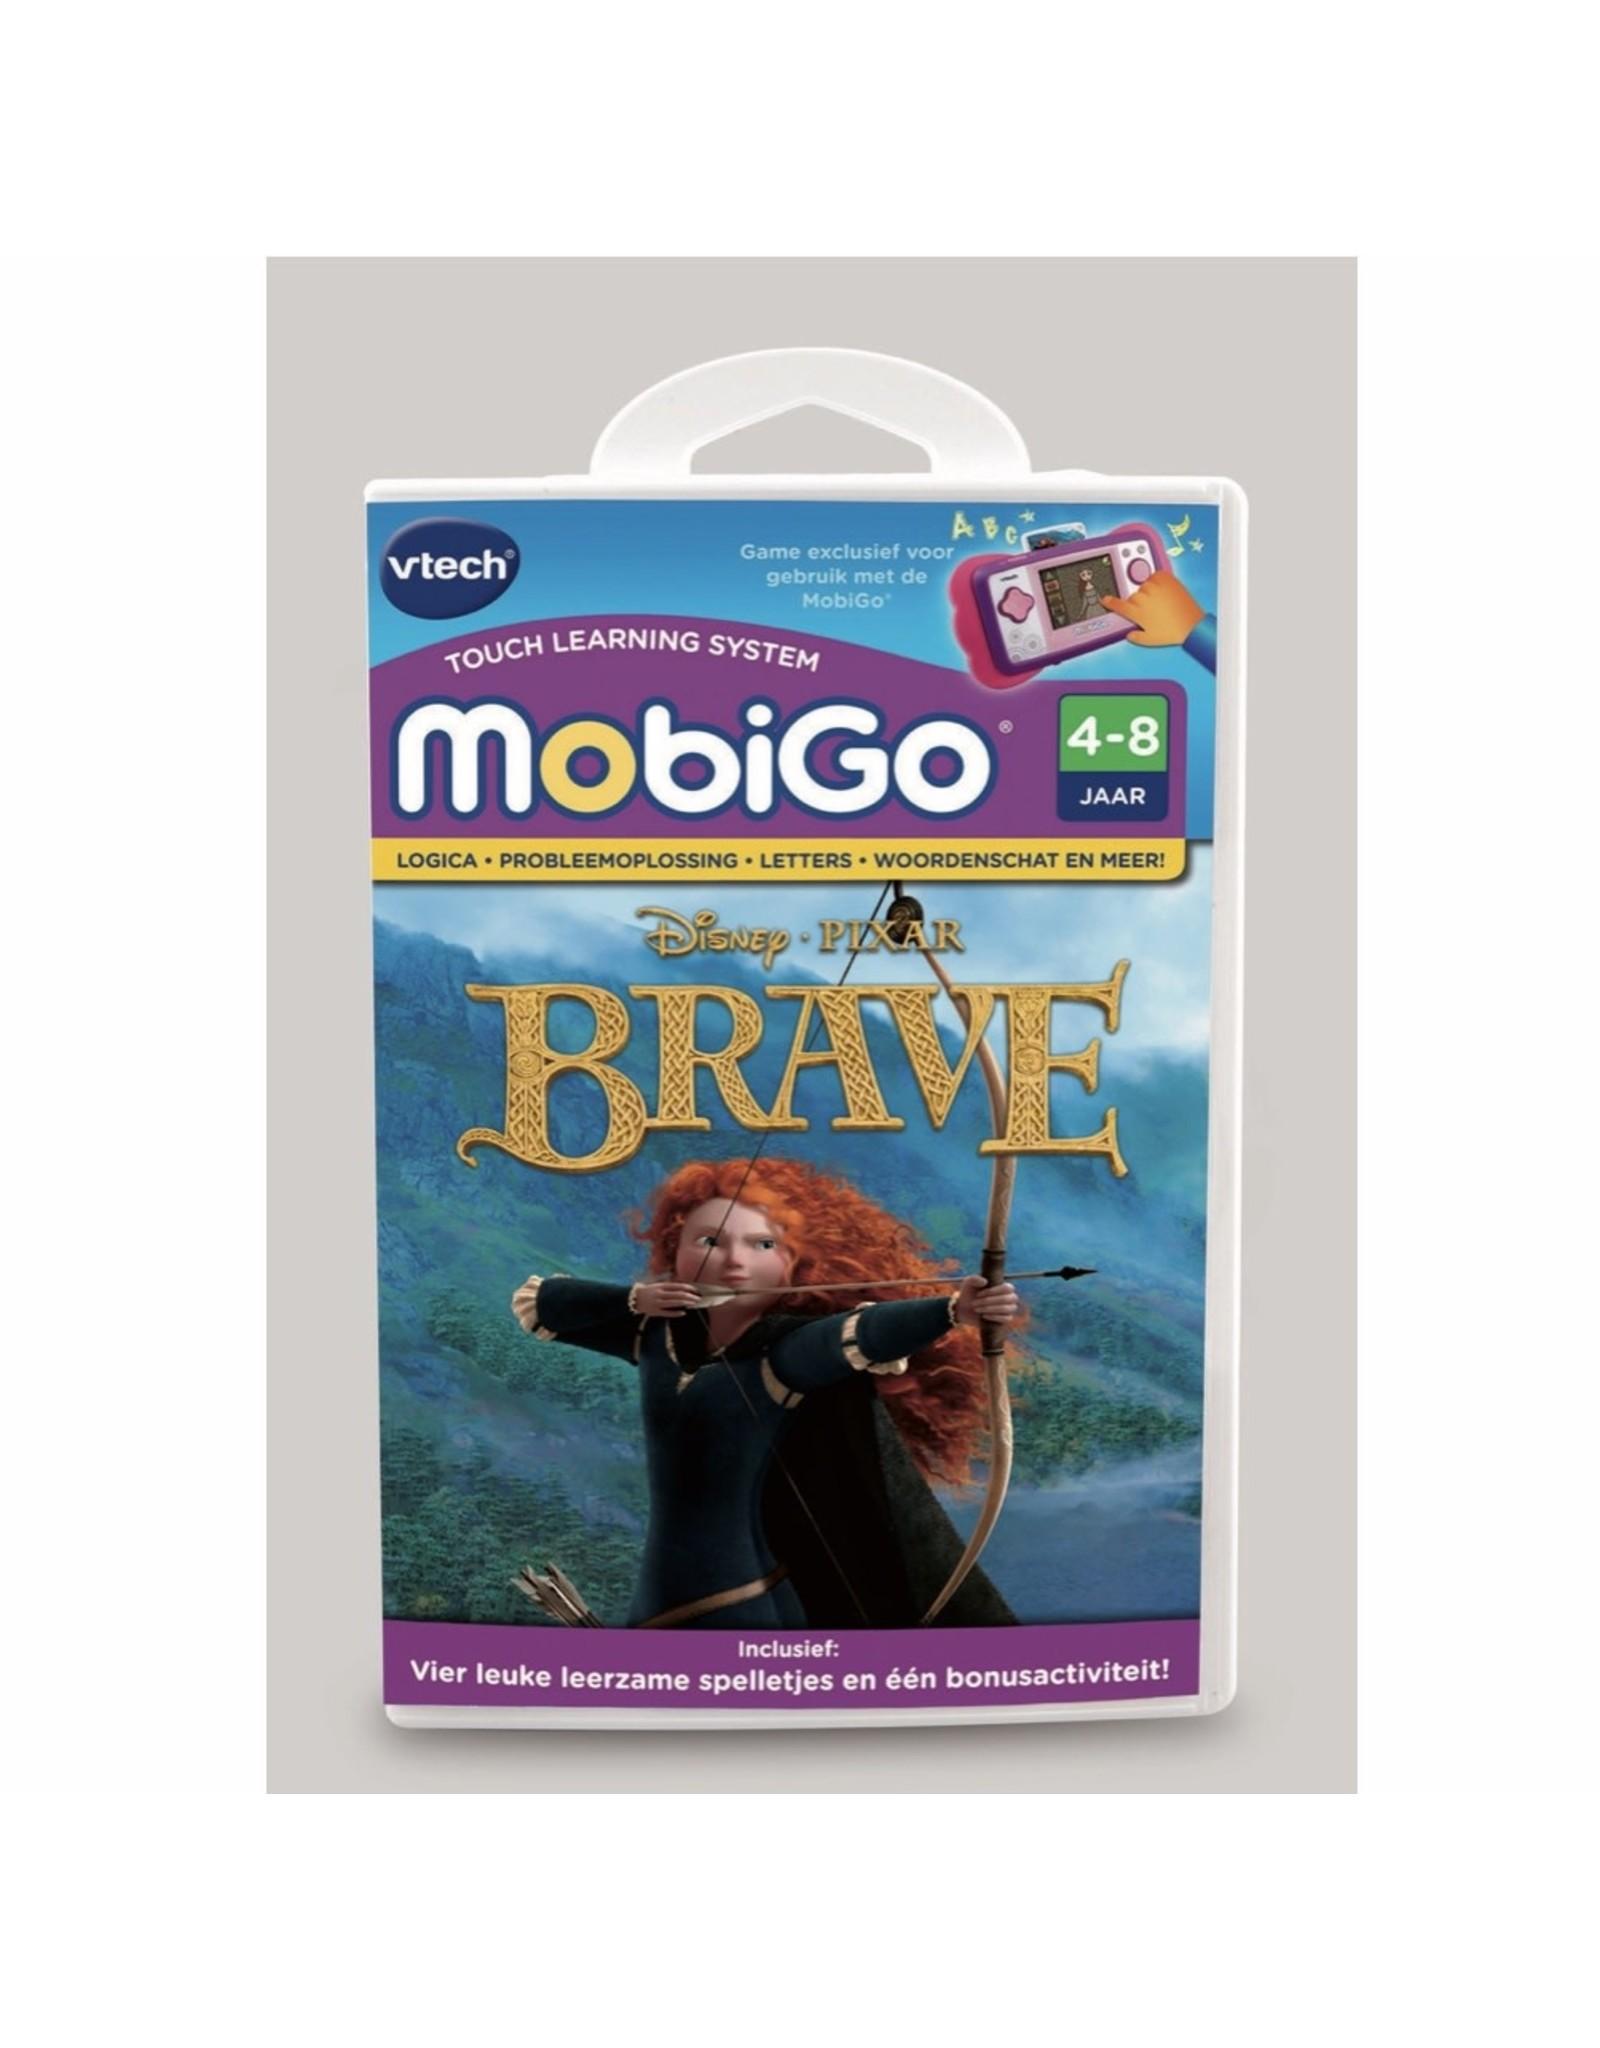 VTECH BRAVE VTECH MOBIGO GAME: 5-8 JR